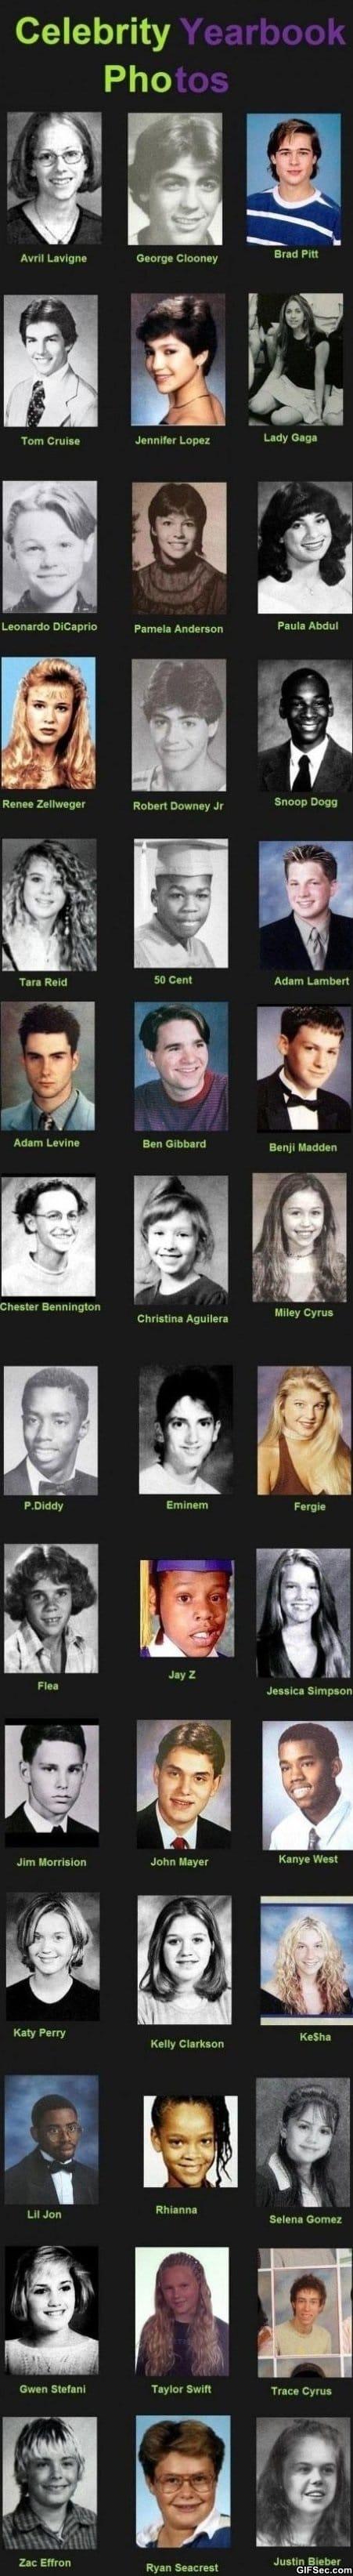 celebrity-yearbook-photos